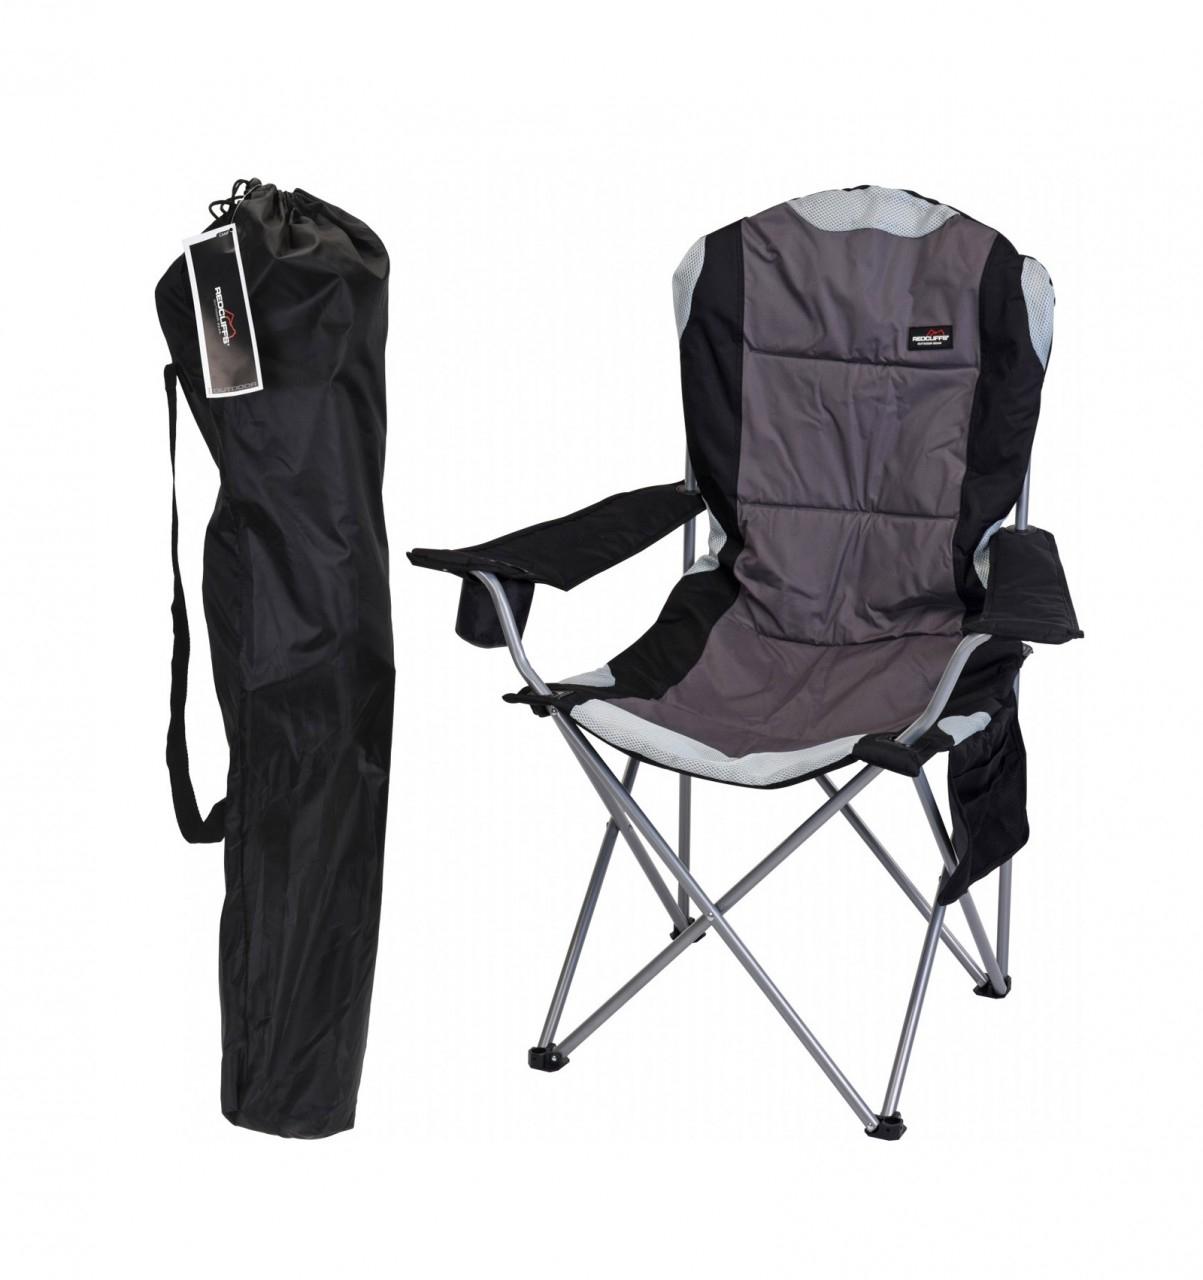 Komfort Klappstuhl Campingstuhl Angelstuhl mit Transporttasche